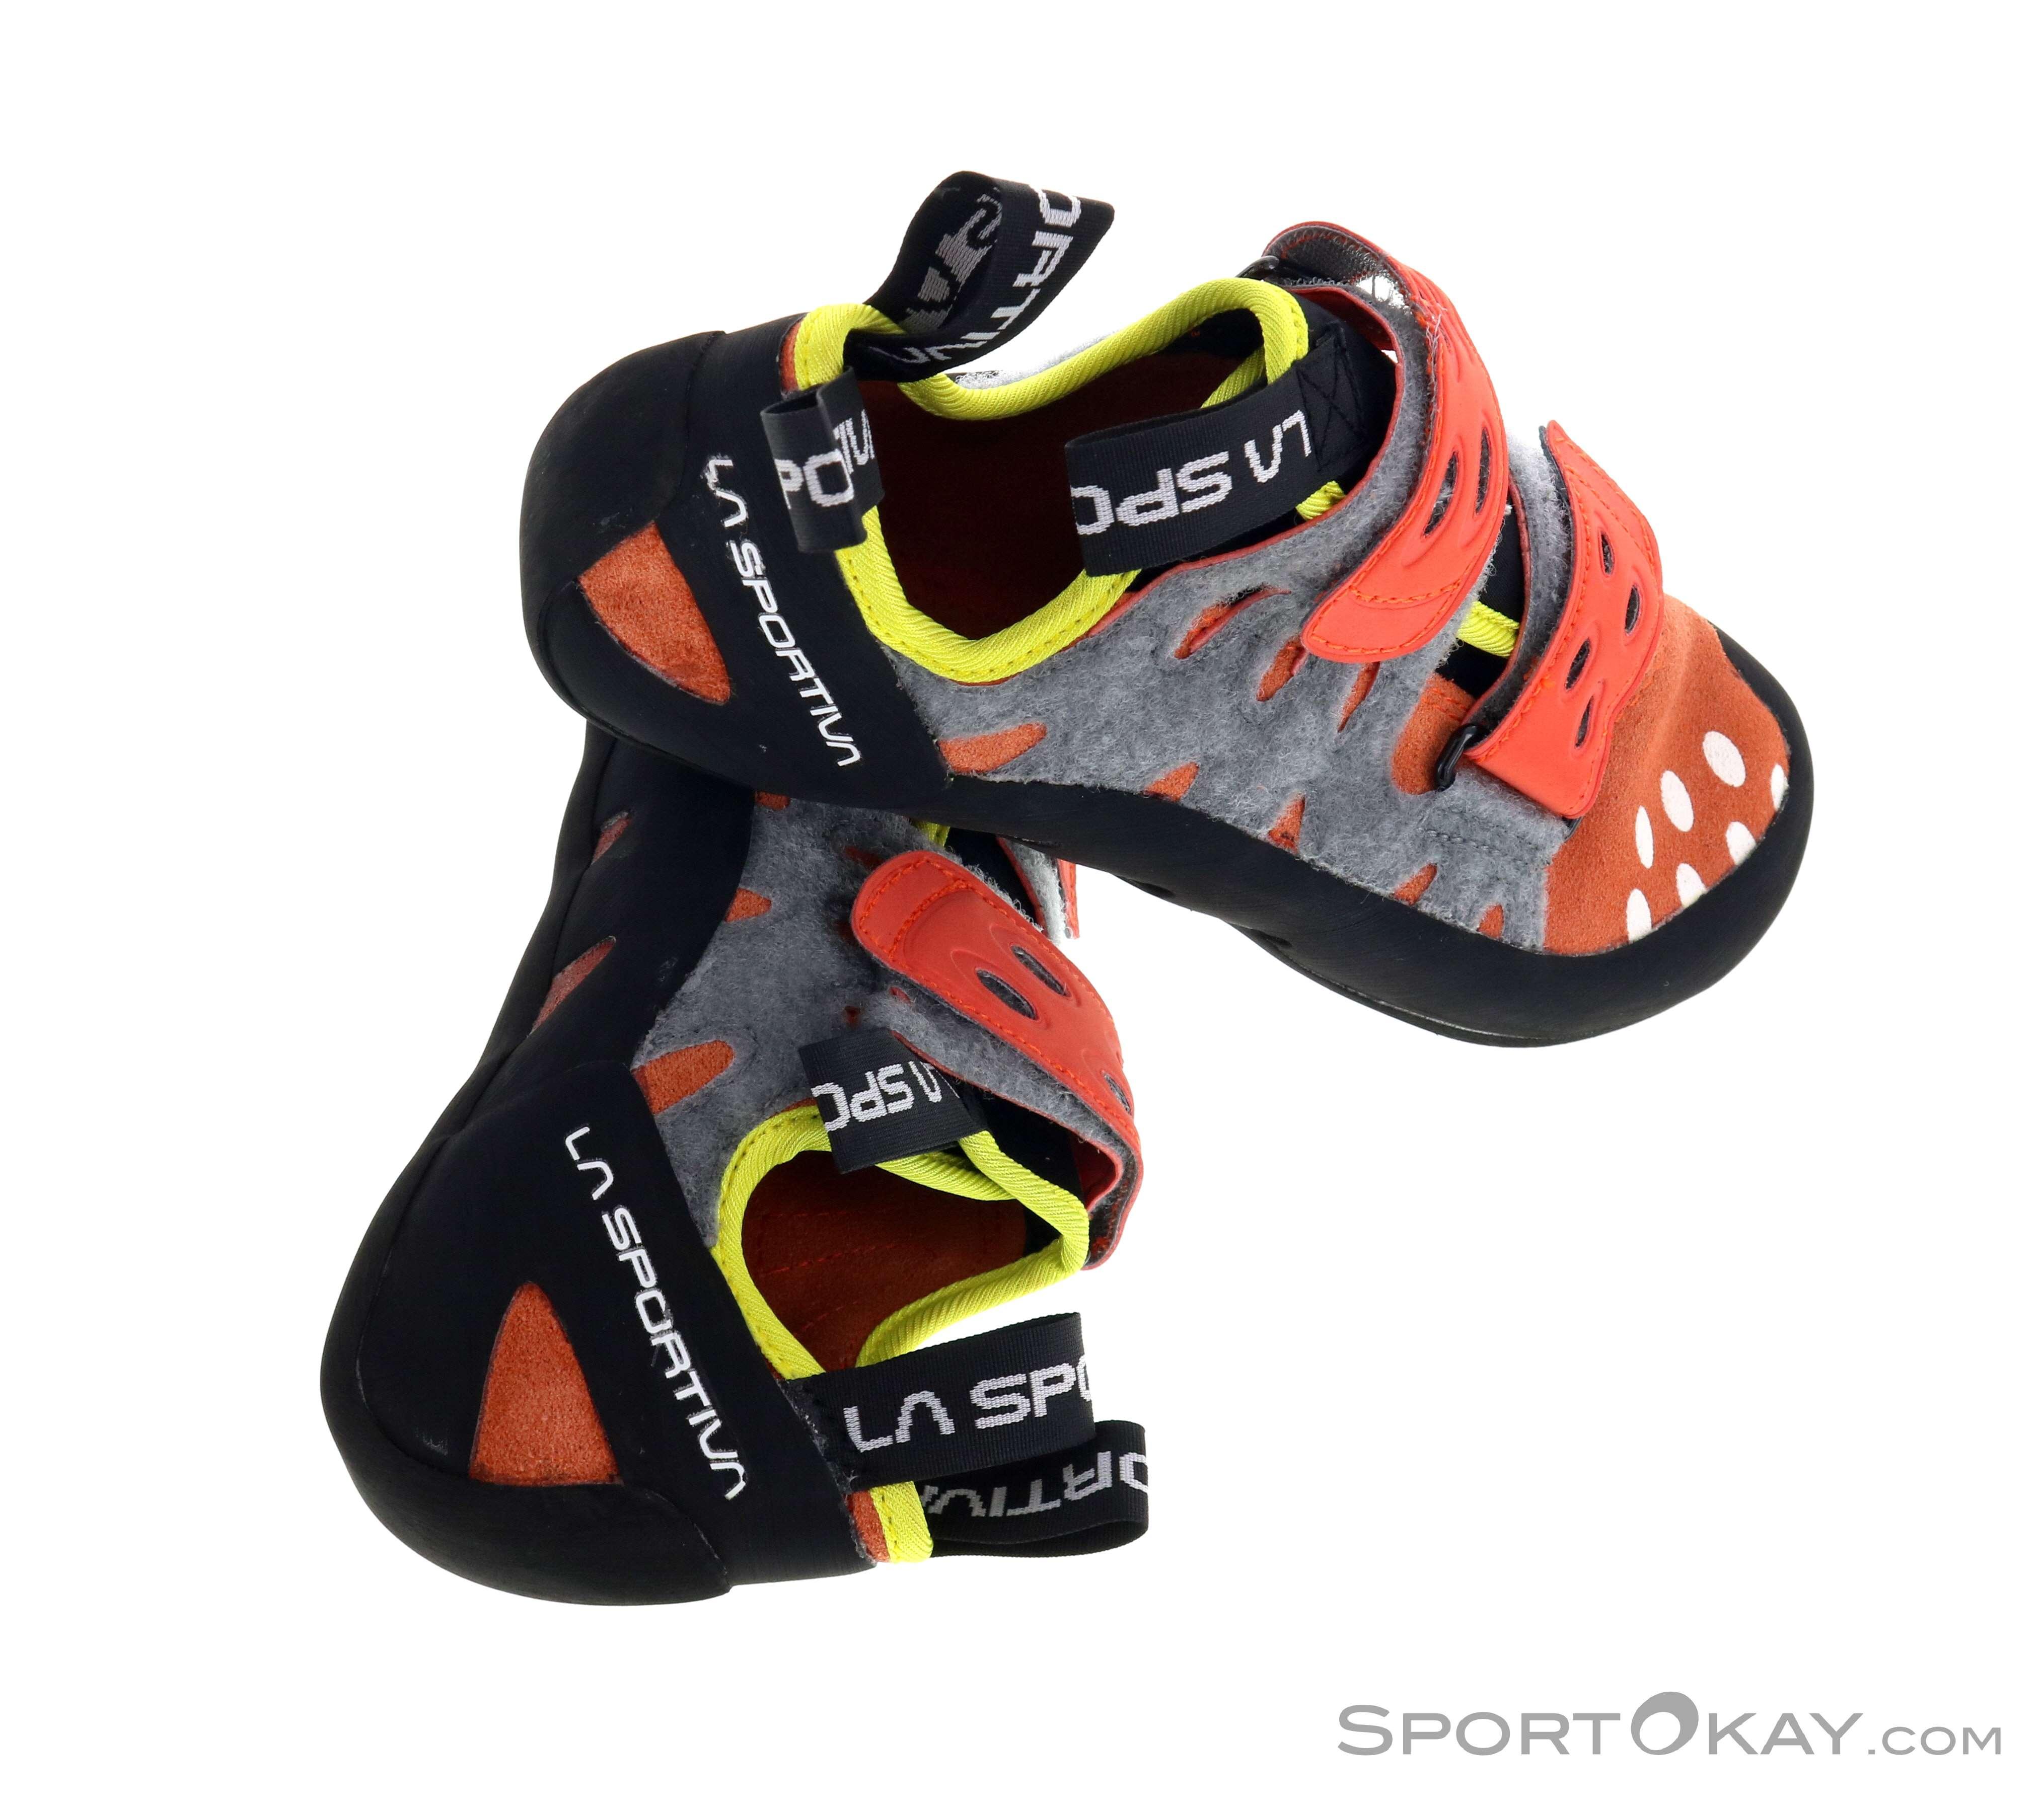 Kletter T-Shirt La Sportiva Damen   Gr S   Climbing Weitere Sportarten